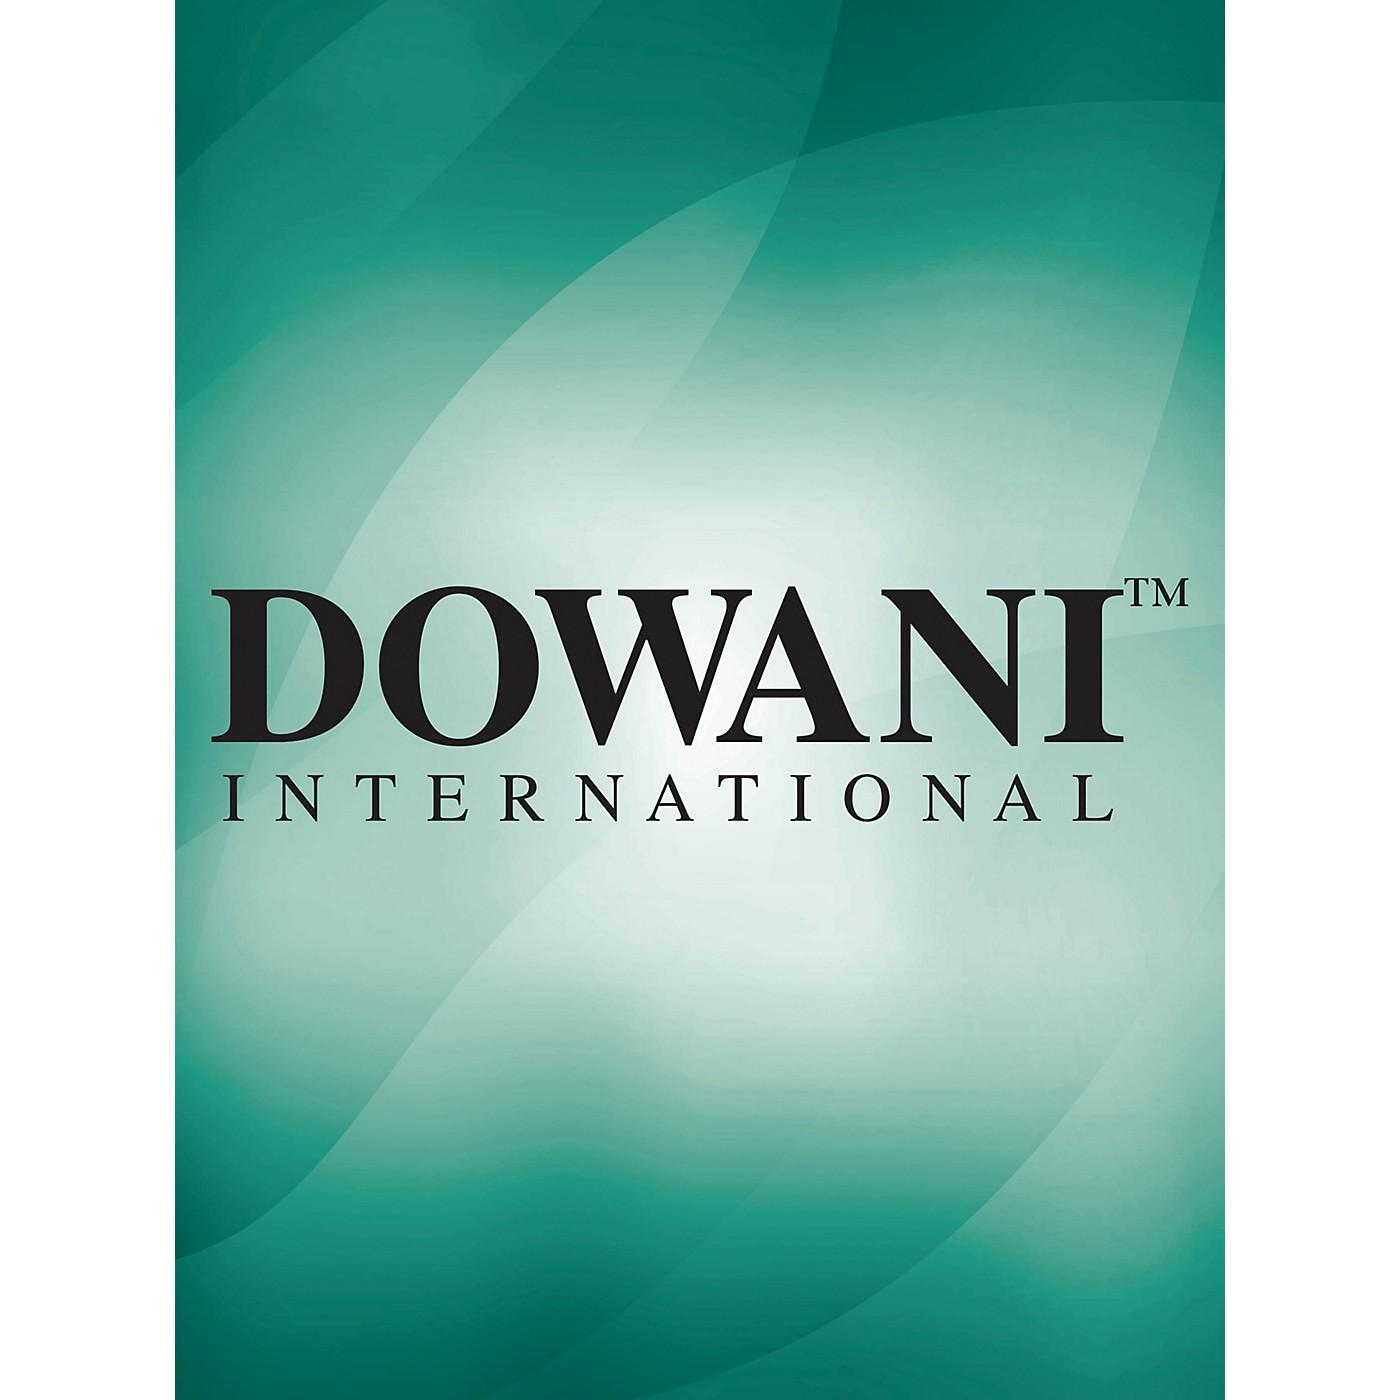 Dowani Editions Schubert - Sonatina I for Violin and Piano Op. Posth. 137 No. 1 - D 384 in D Major Dowani Book/CD Series thumbnail